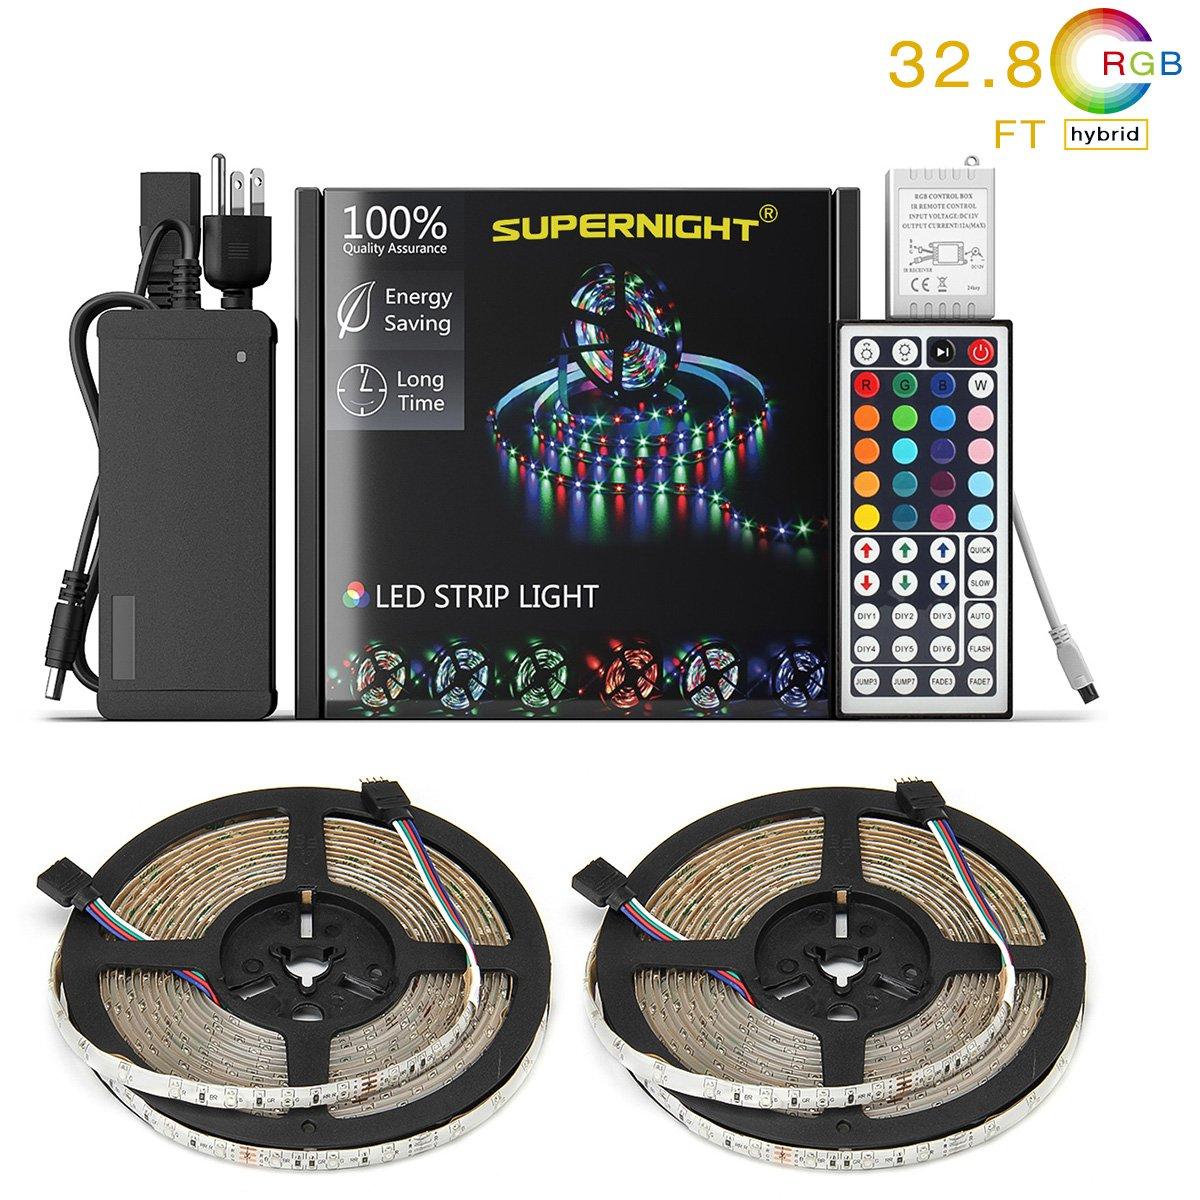 LED Strip Lights Kit Waterproof – Two 16.4ft 600 LEDs SMD 3528 RGB Light $12.99